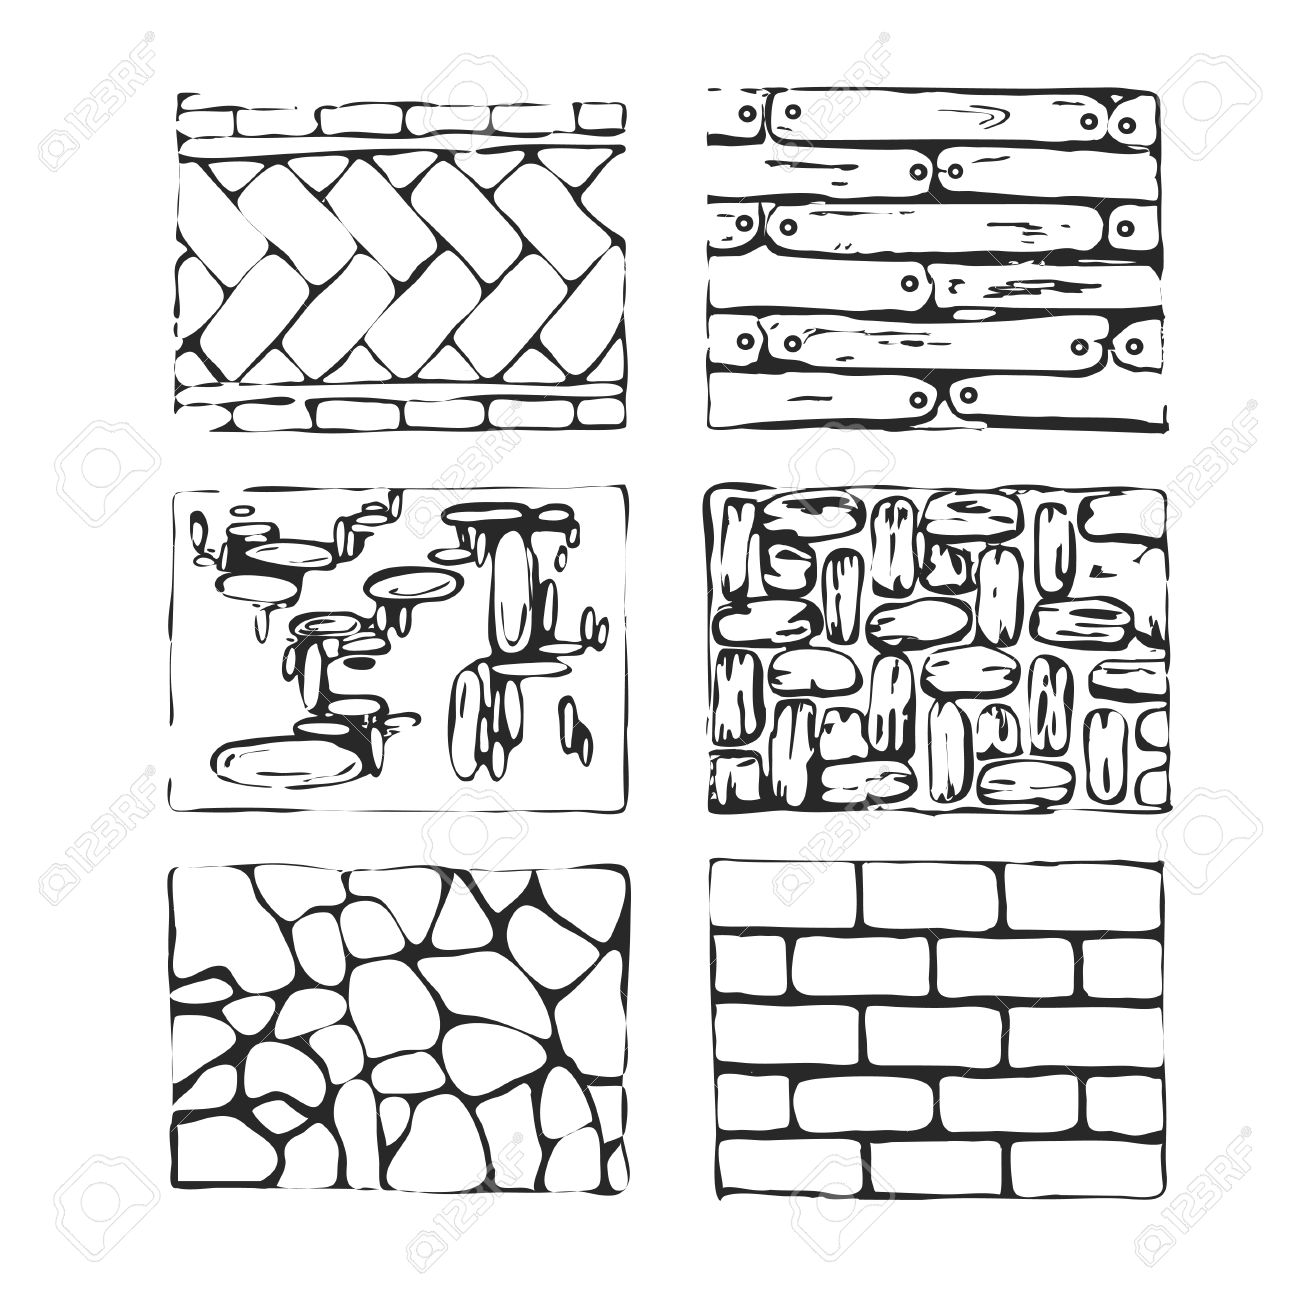 1300x1300 Hand Drawn Paving Stones And Blocks. Detailed Landscape Design